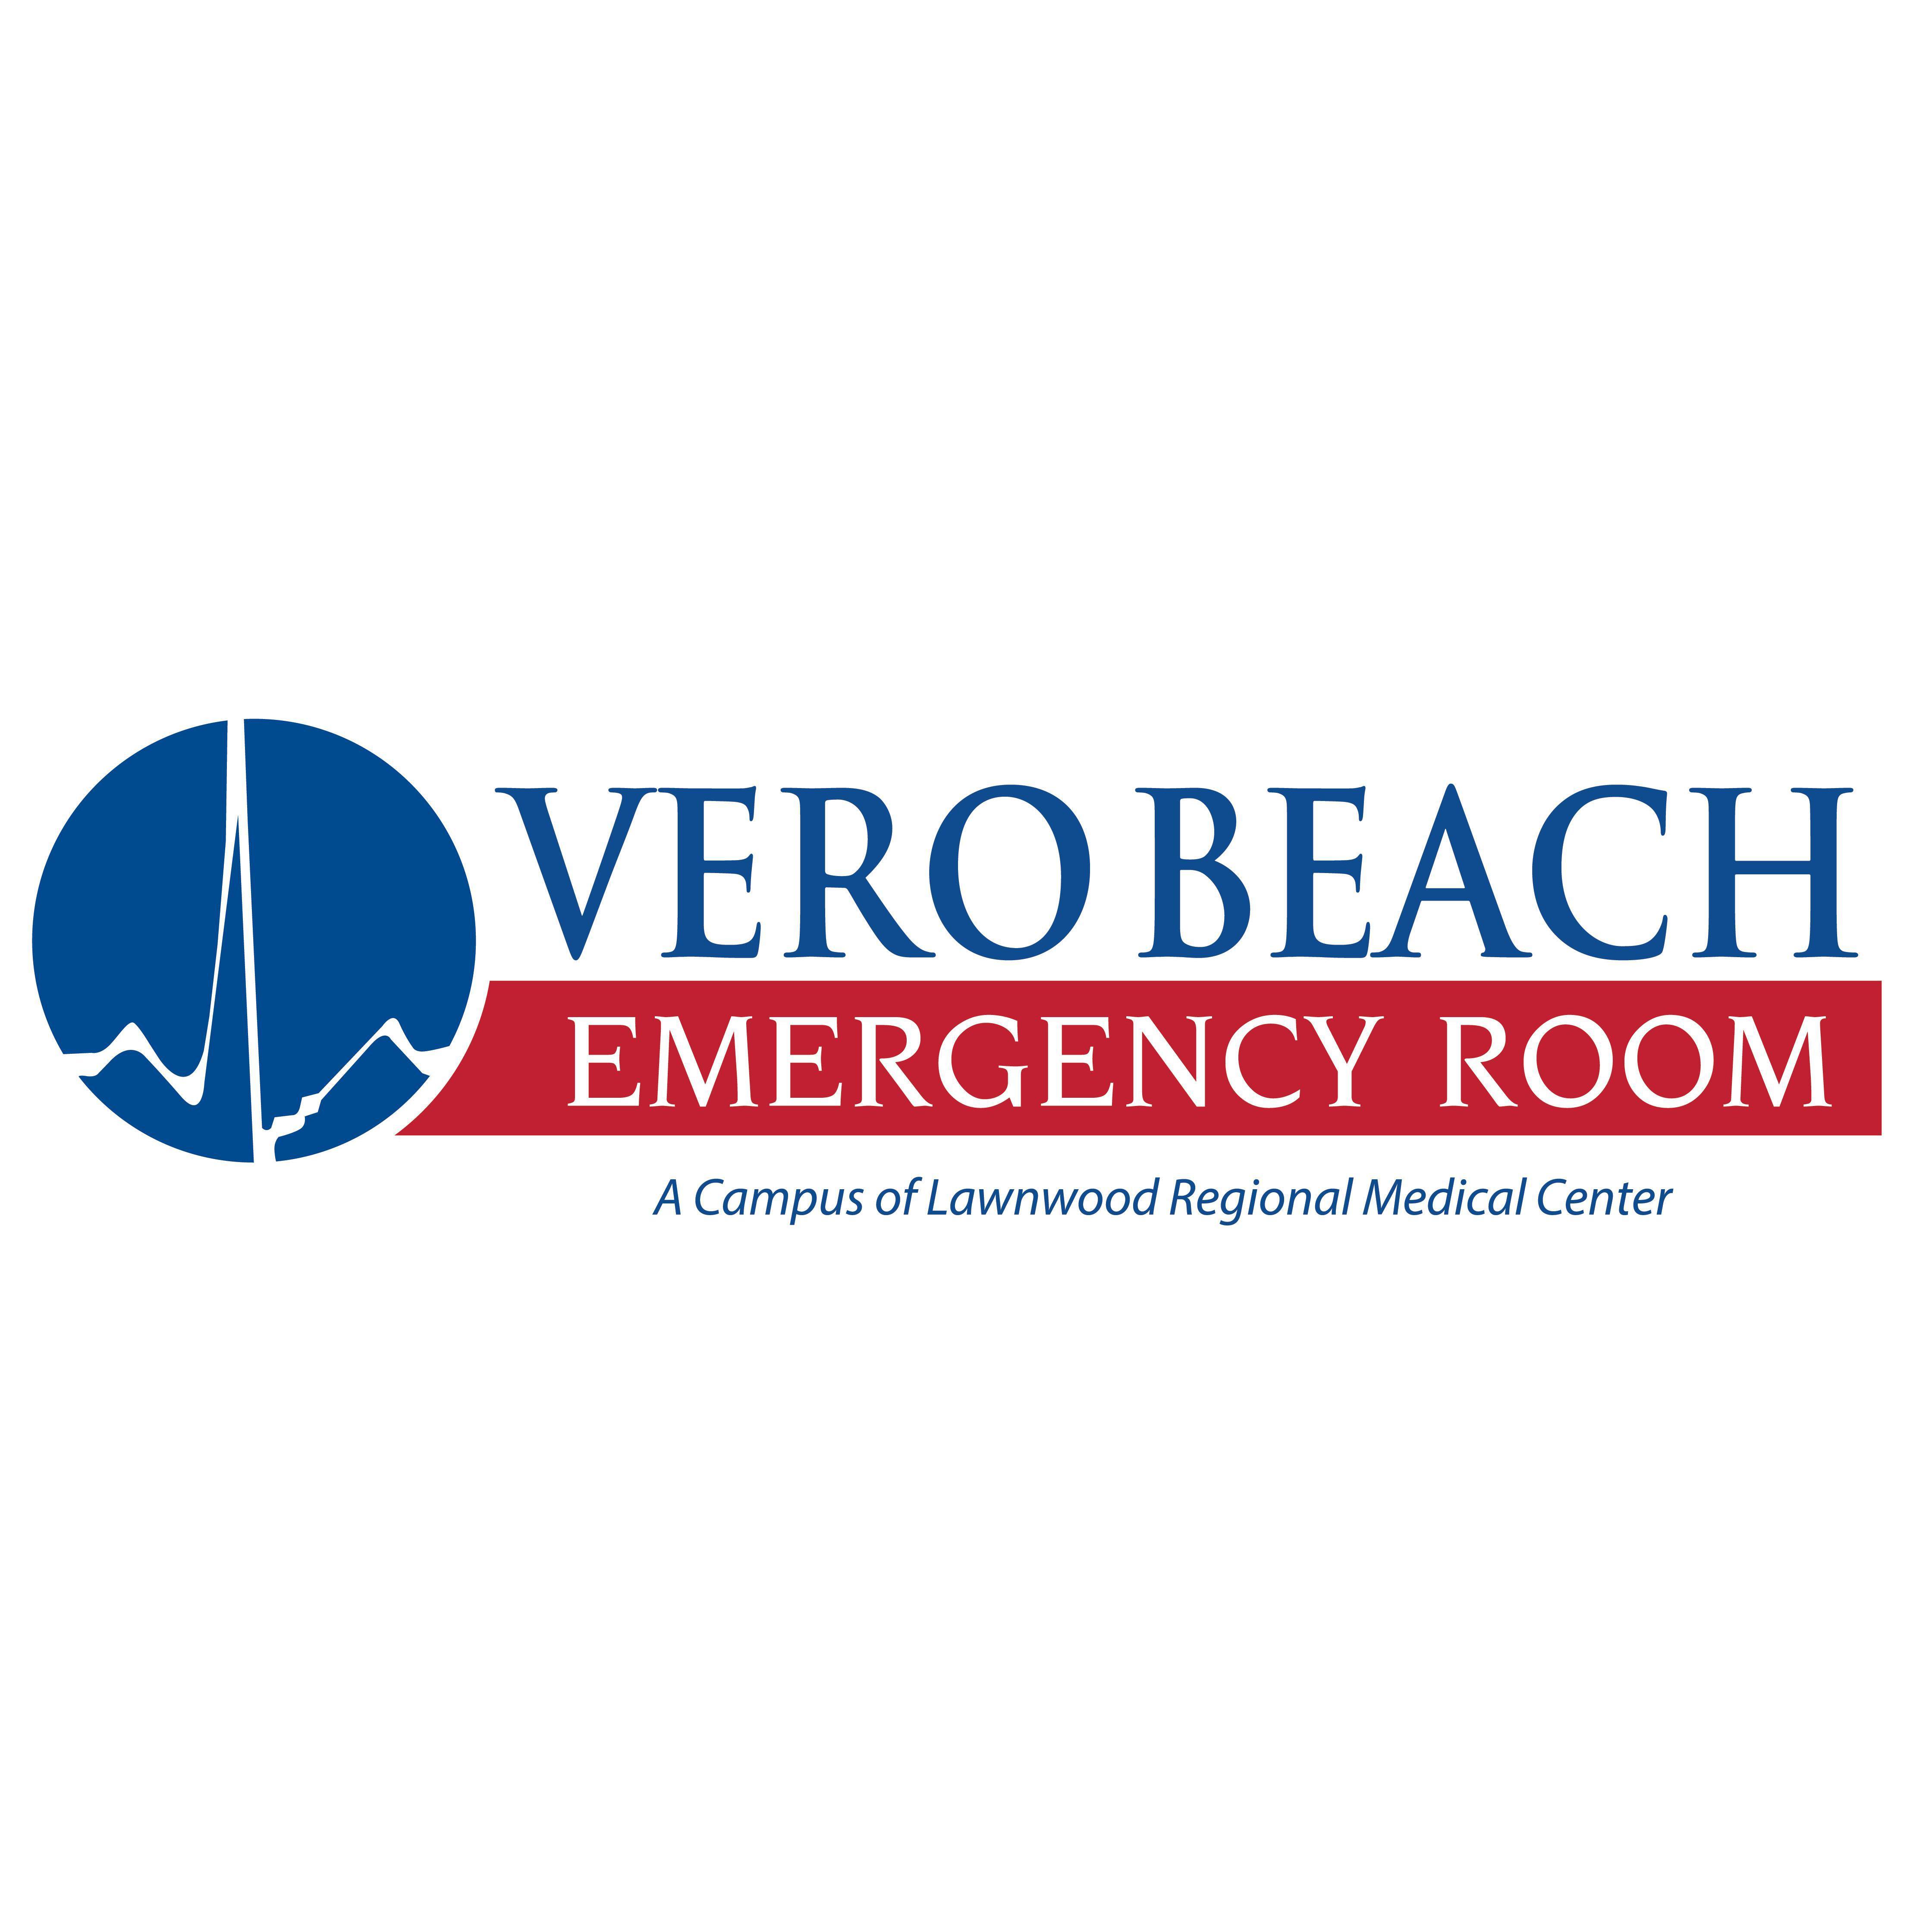 Vero Beach Emergency Room A Campus of Lawnwood Regional Medical Center - Vero Beach, FL 32962 - (772)563-5500 | ShowMeLocal.com